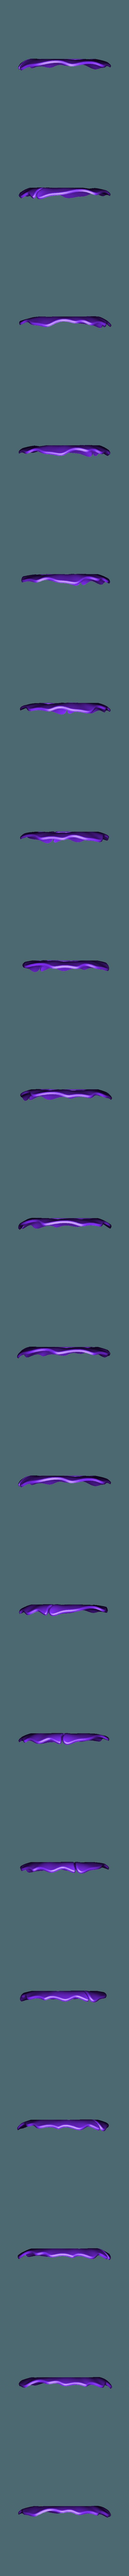 donut-top.stl Download free STL file 2 Color Donut • 3D printing design, filamentone